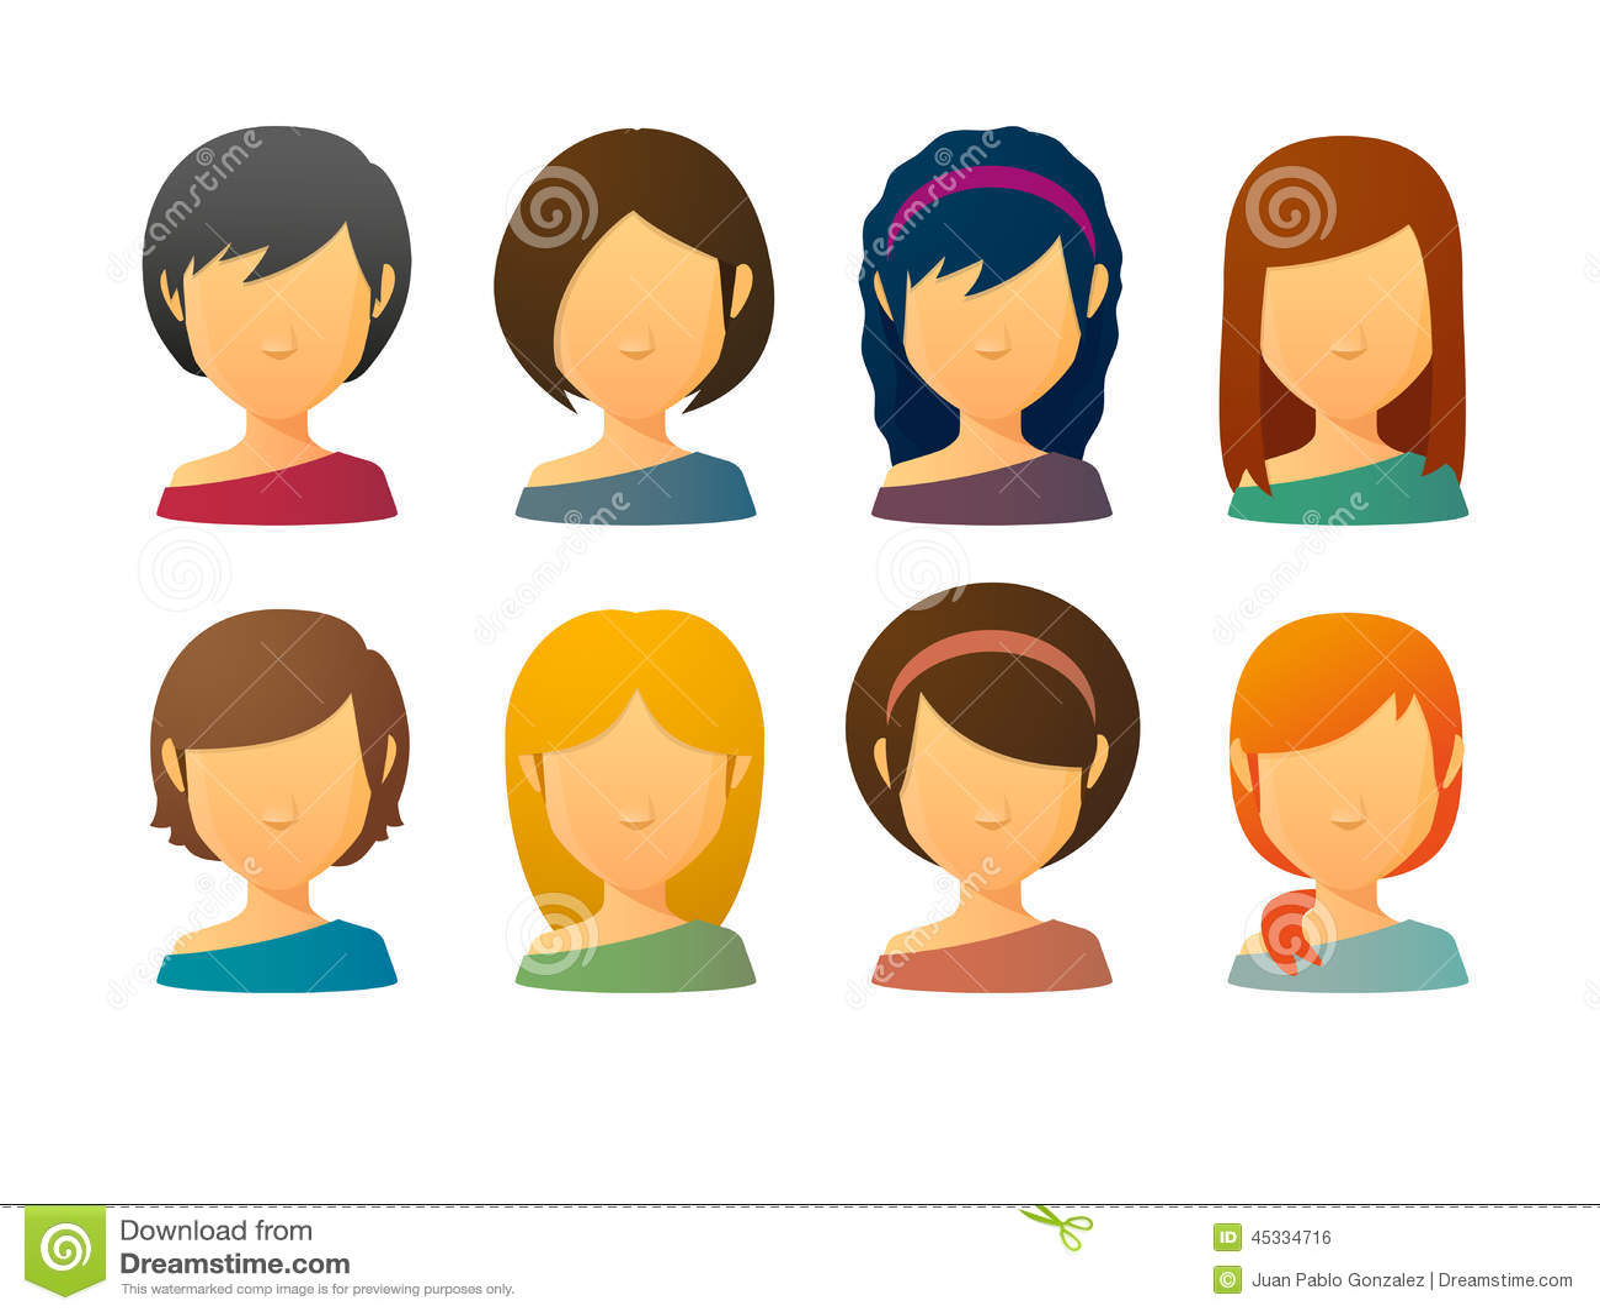 Faceless Female Avatars With Various Hair Styles Stock